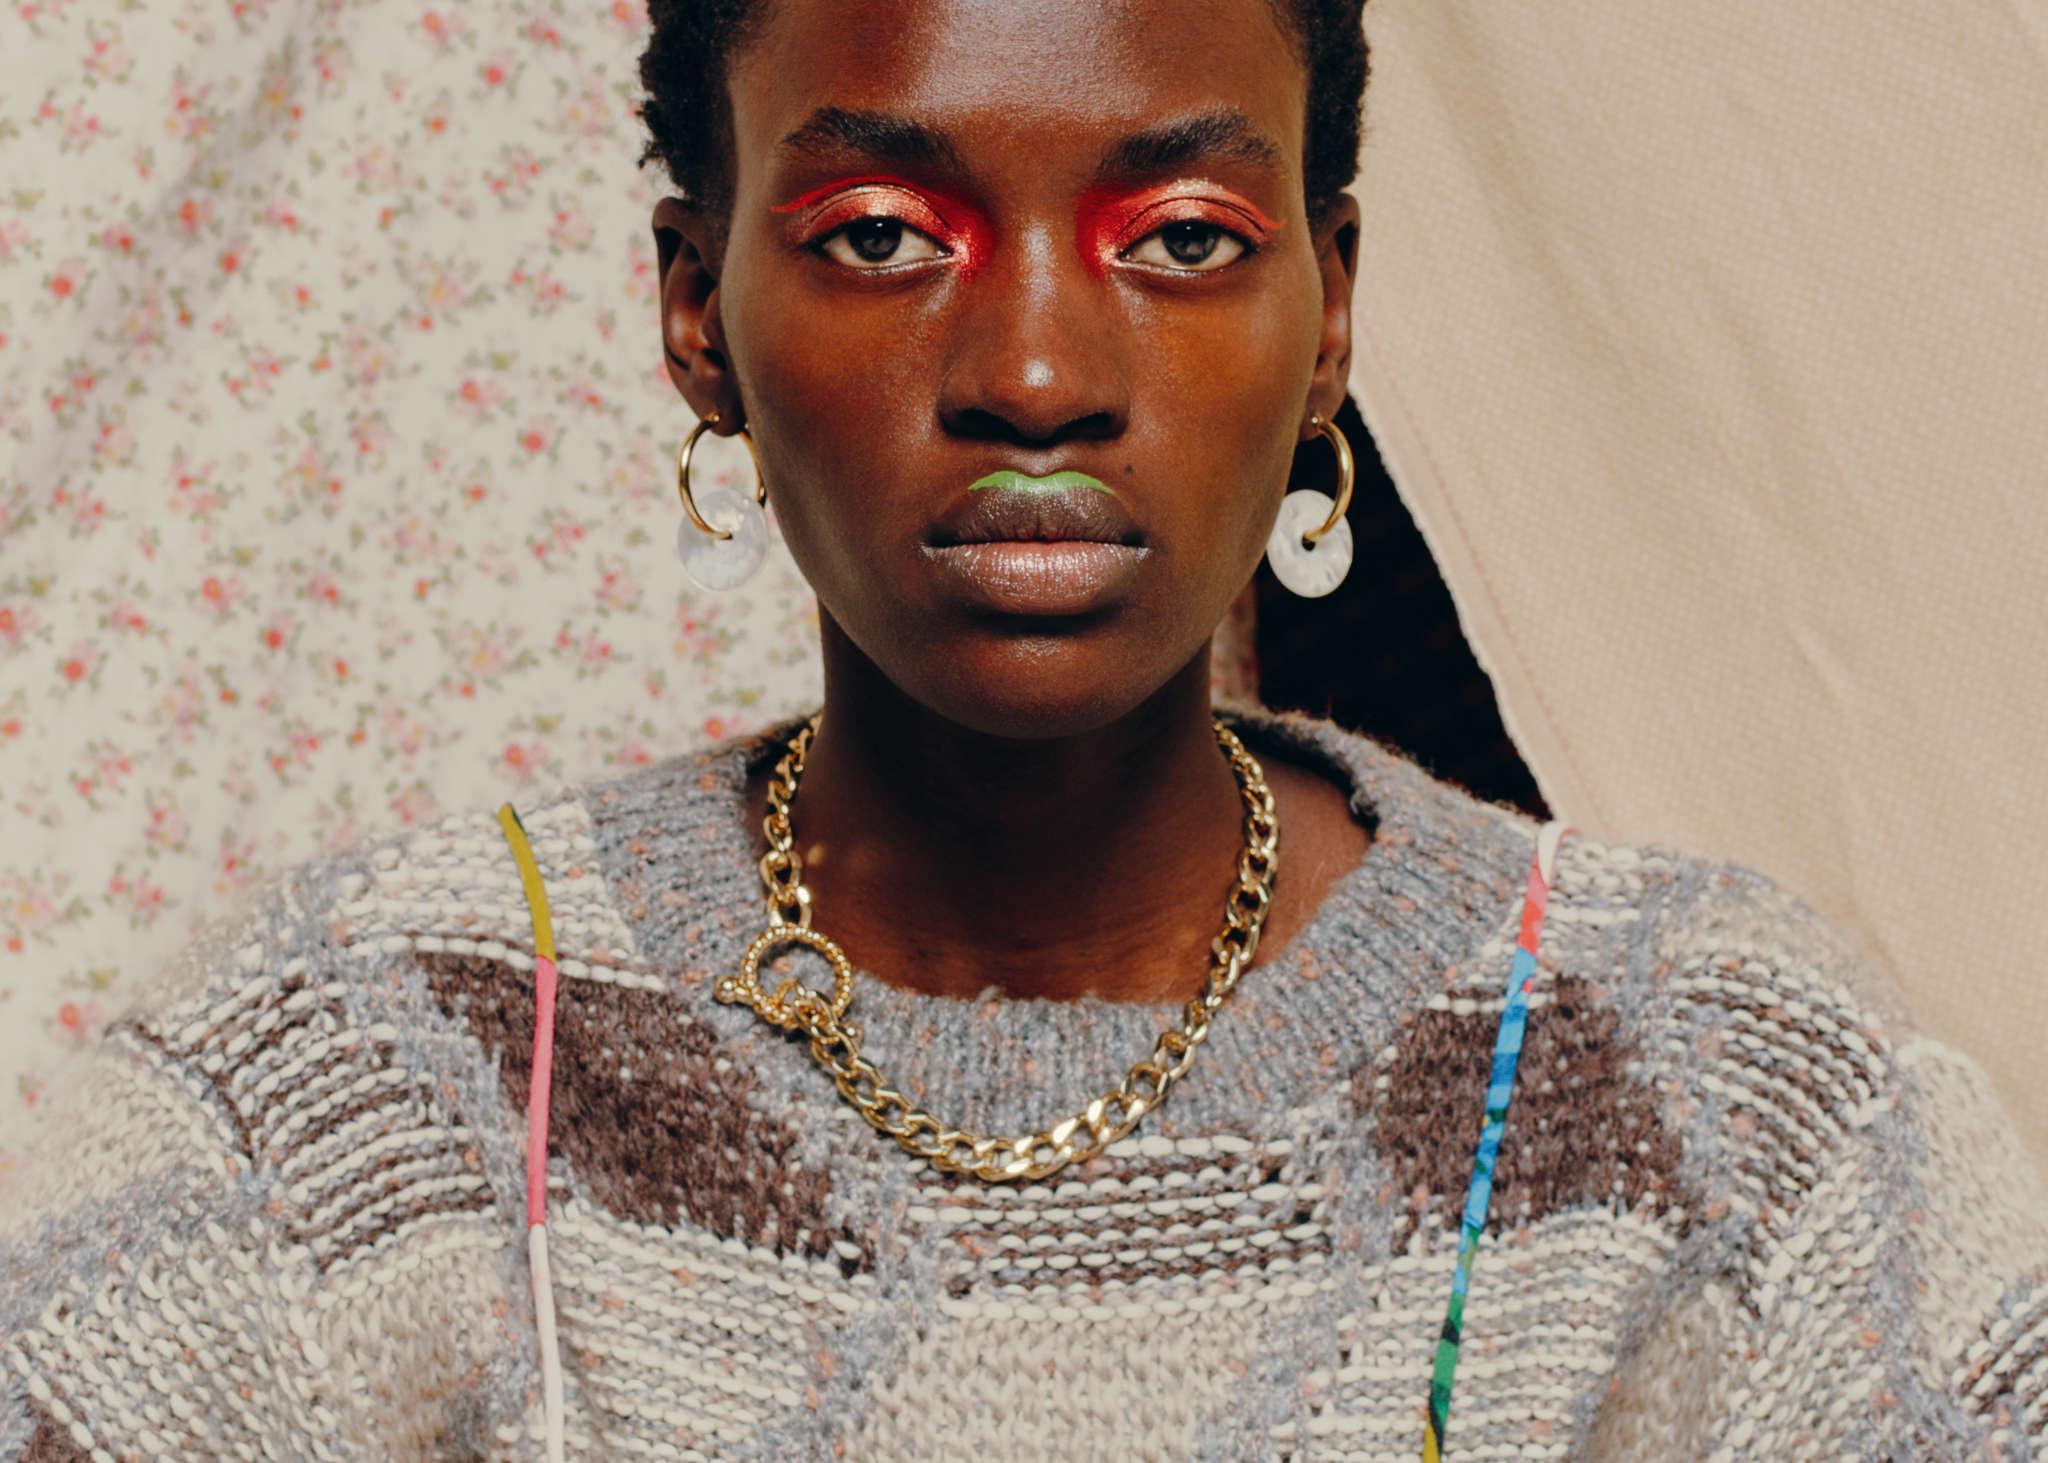 Rock It Vintage jumper, Mara Hoffmann dress, Rejina Pyo earrings